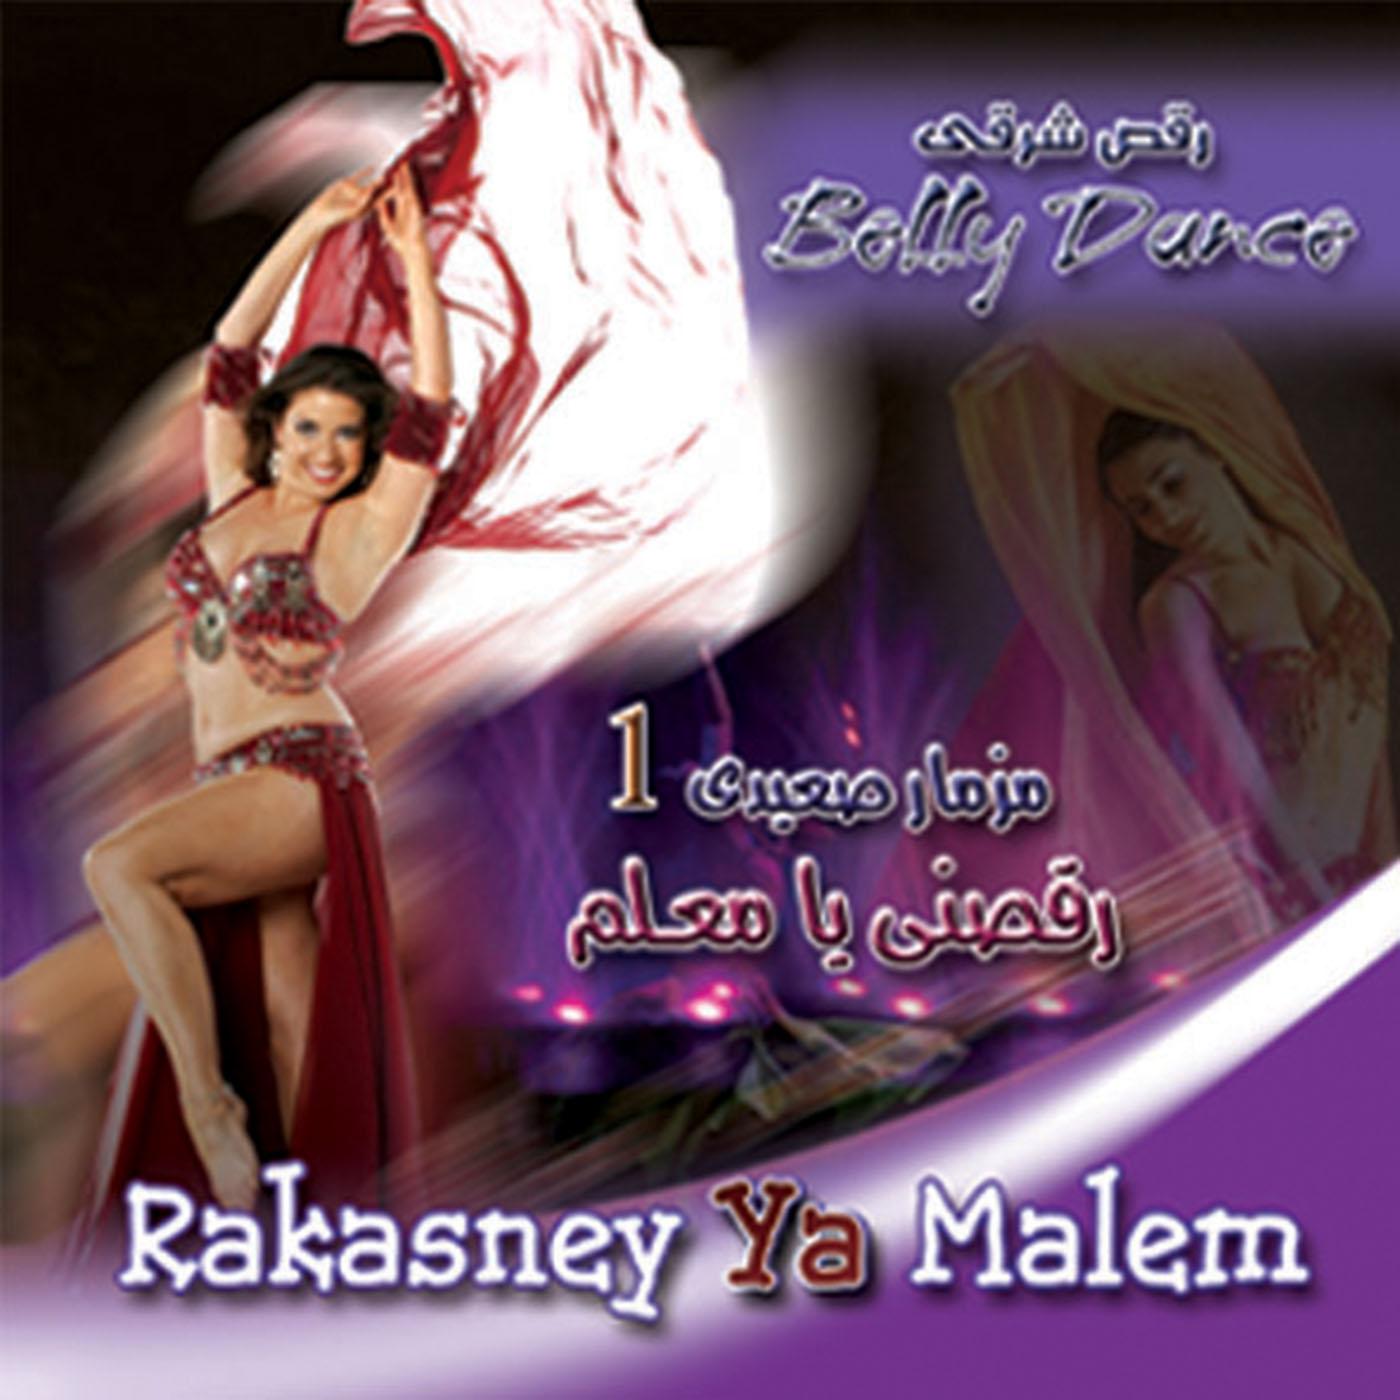 Belly Dance (Rakasney Ya Malem 1)/  Mezmar Sidi : Antar Huseen   BUY IT